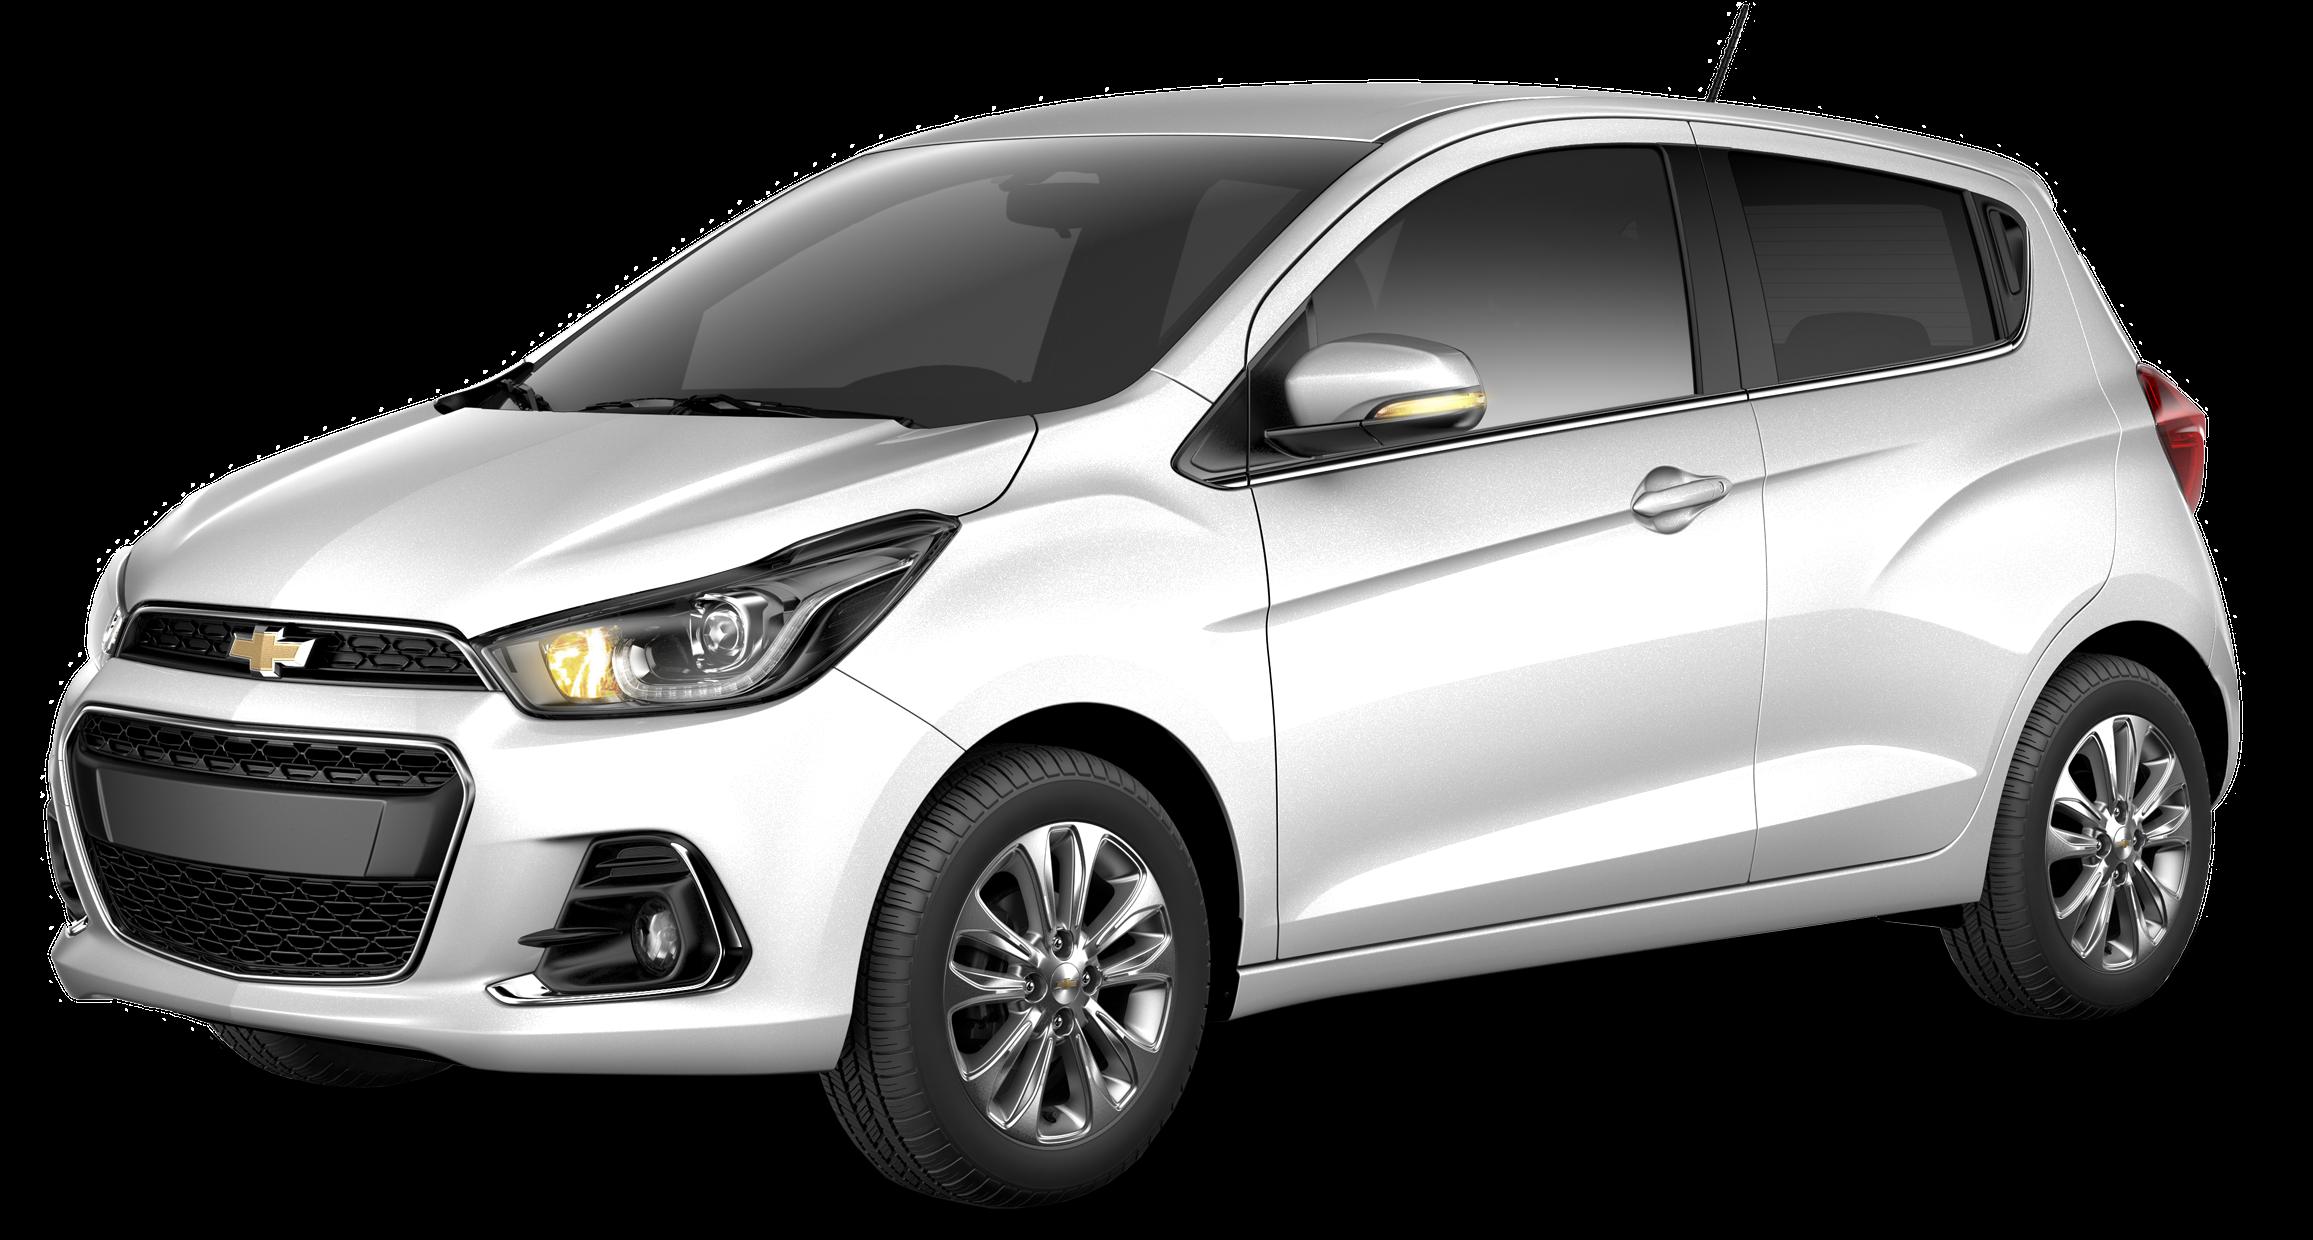 Kelebihan Mobil Toyota Terbaru Perbandingan Harga